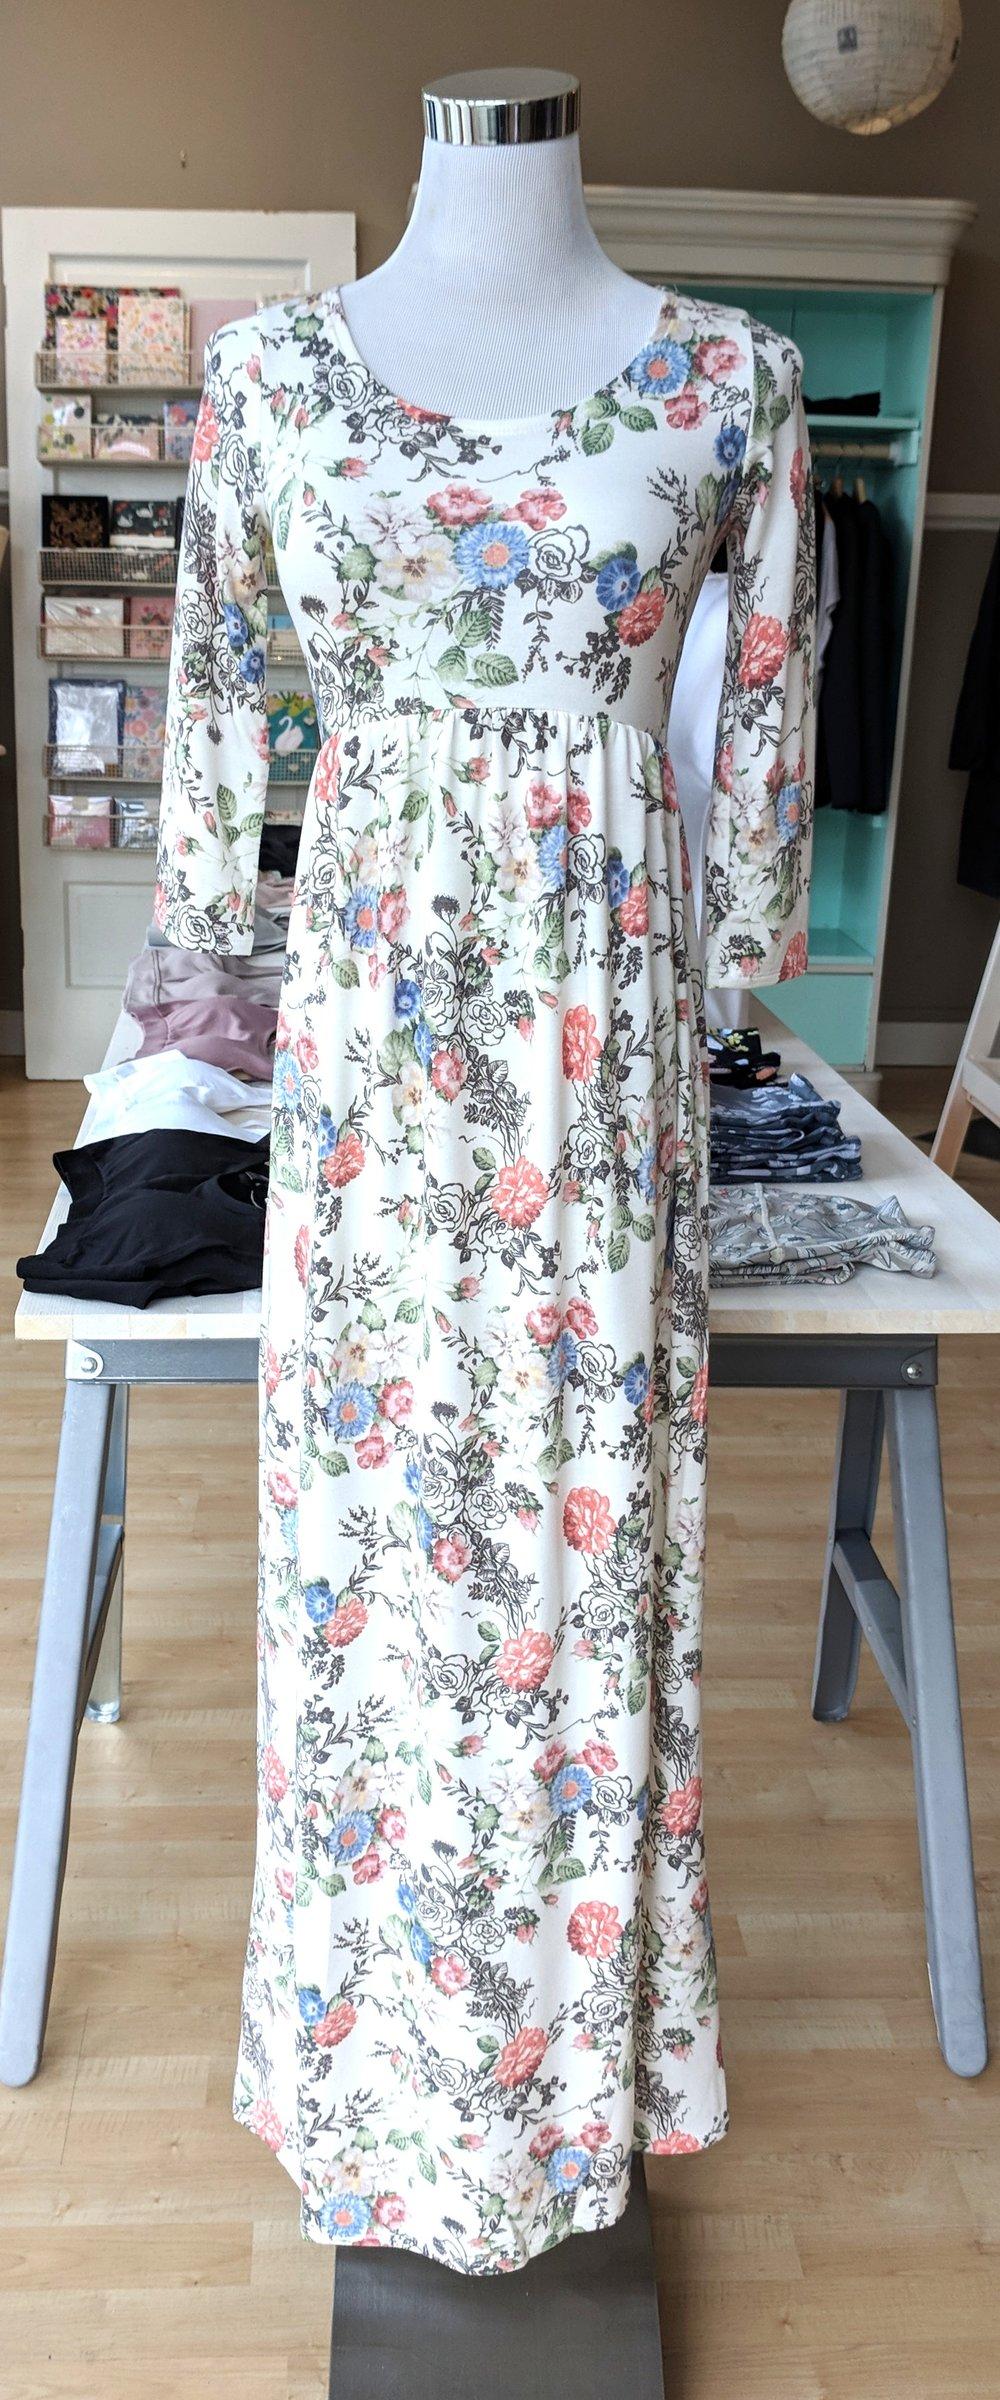 Floral long Maxi dress $38